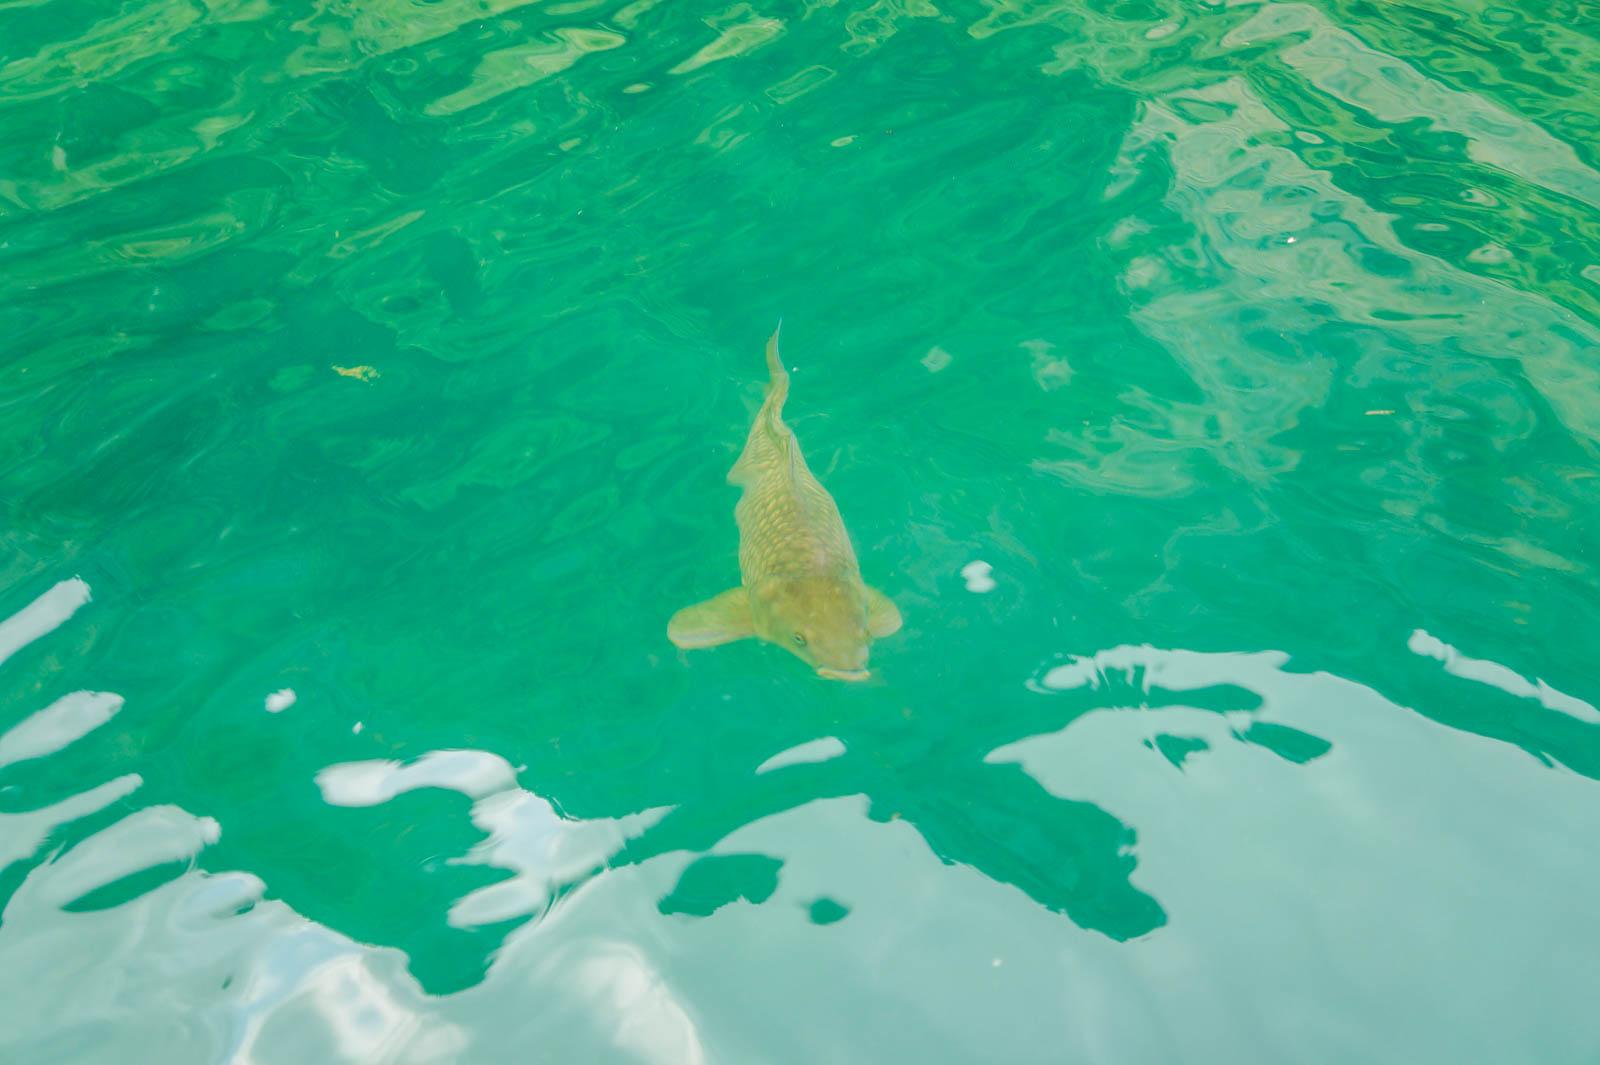 kourna-lake-crete-greece-la-vie-en-blog-all-rights-reserved-5